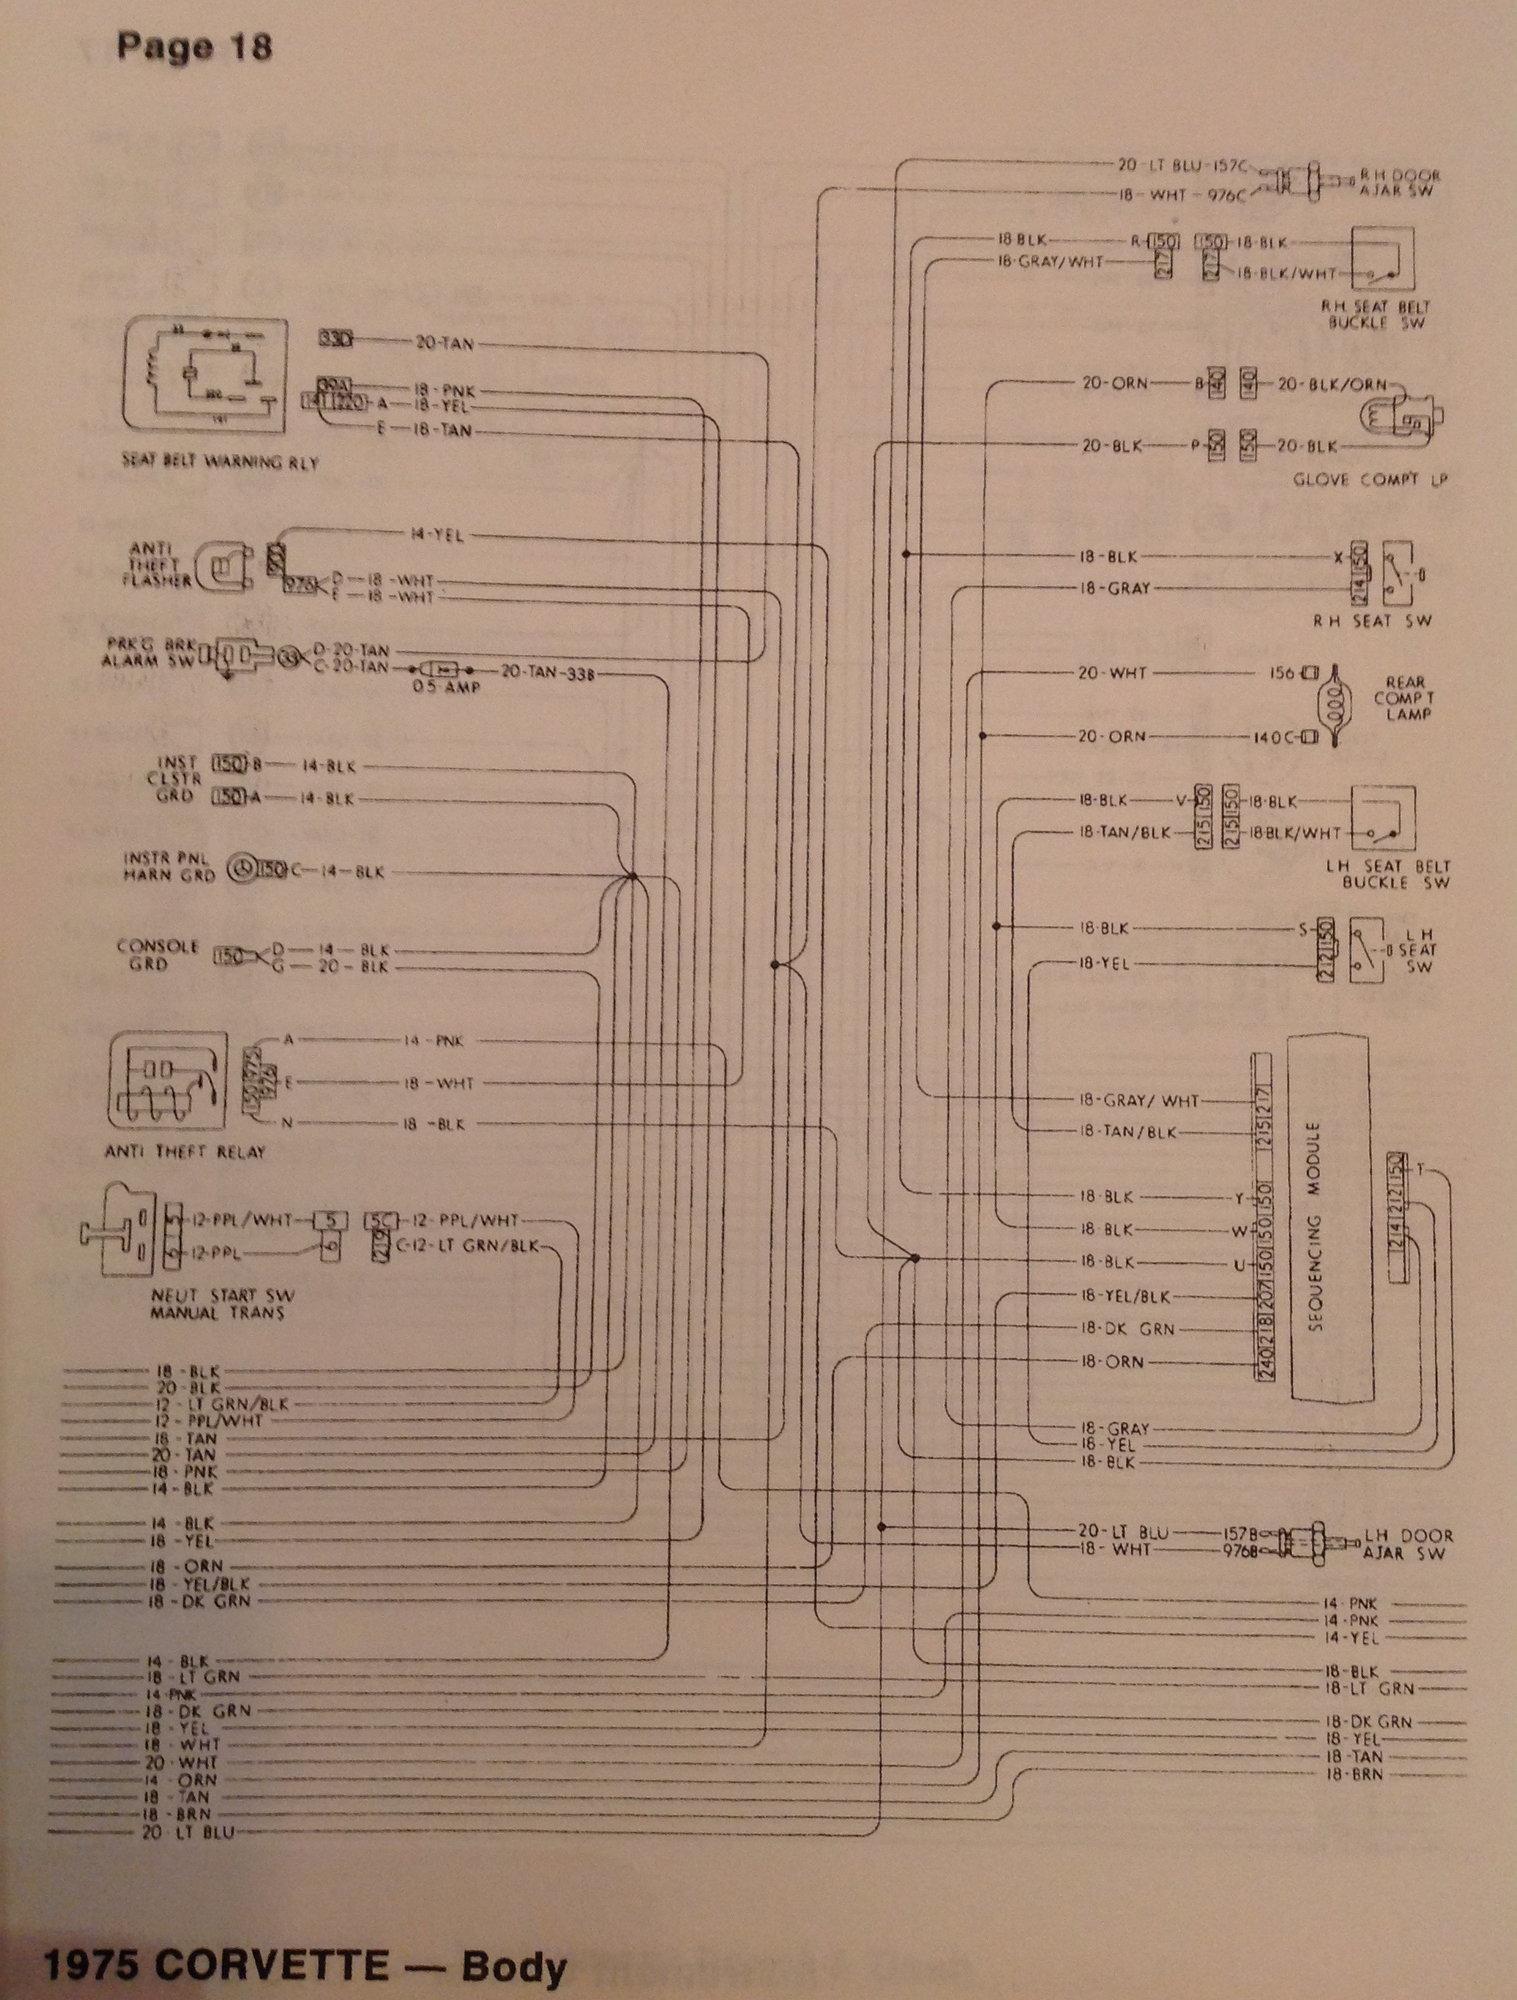 1975 wiring diagram - CorvetteForum - Chevrolet Corvette ...